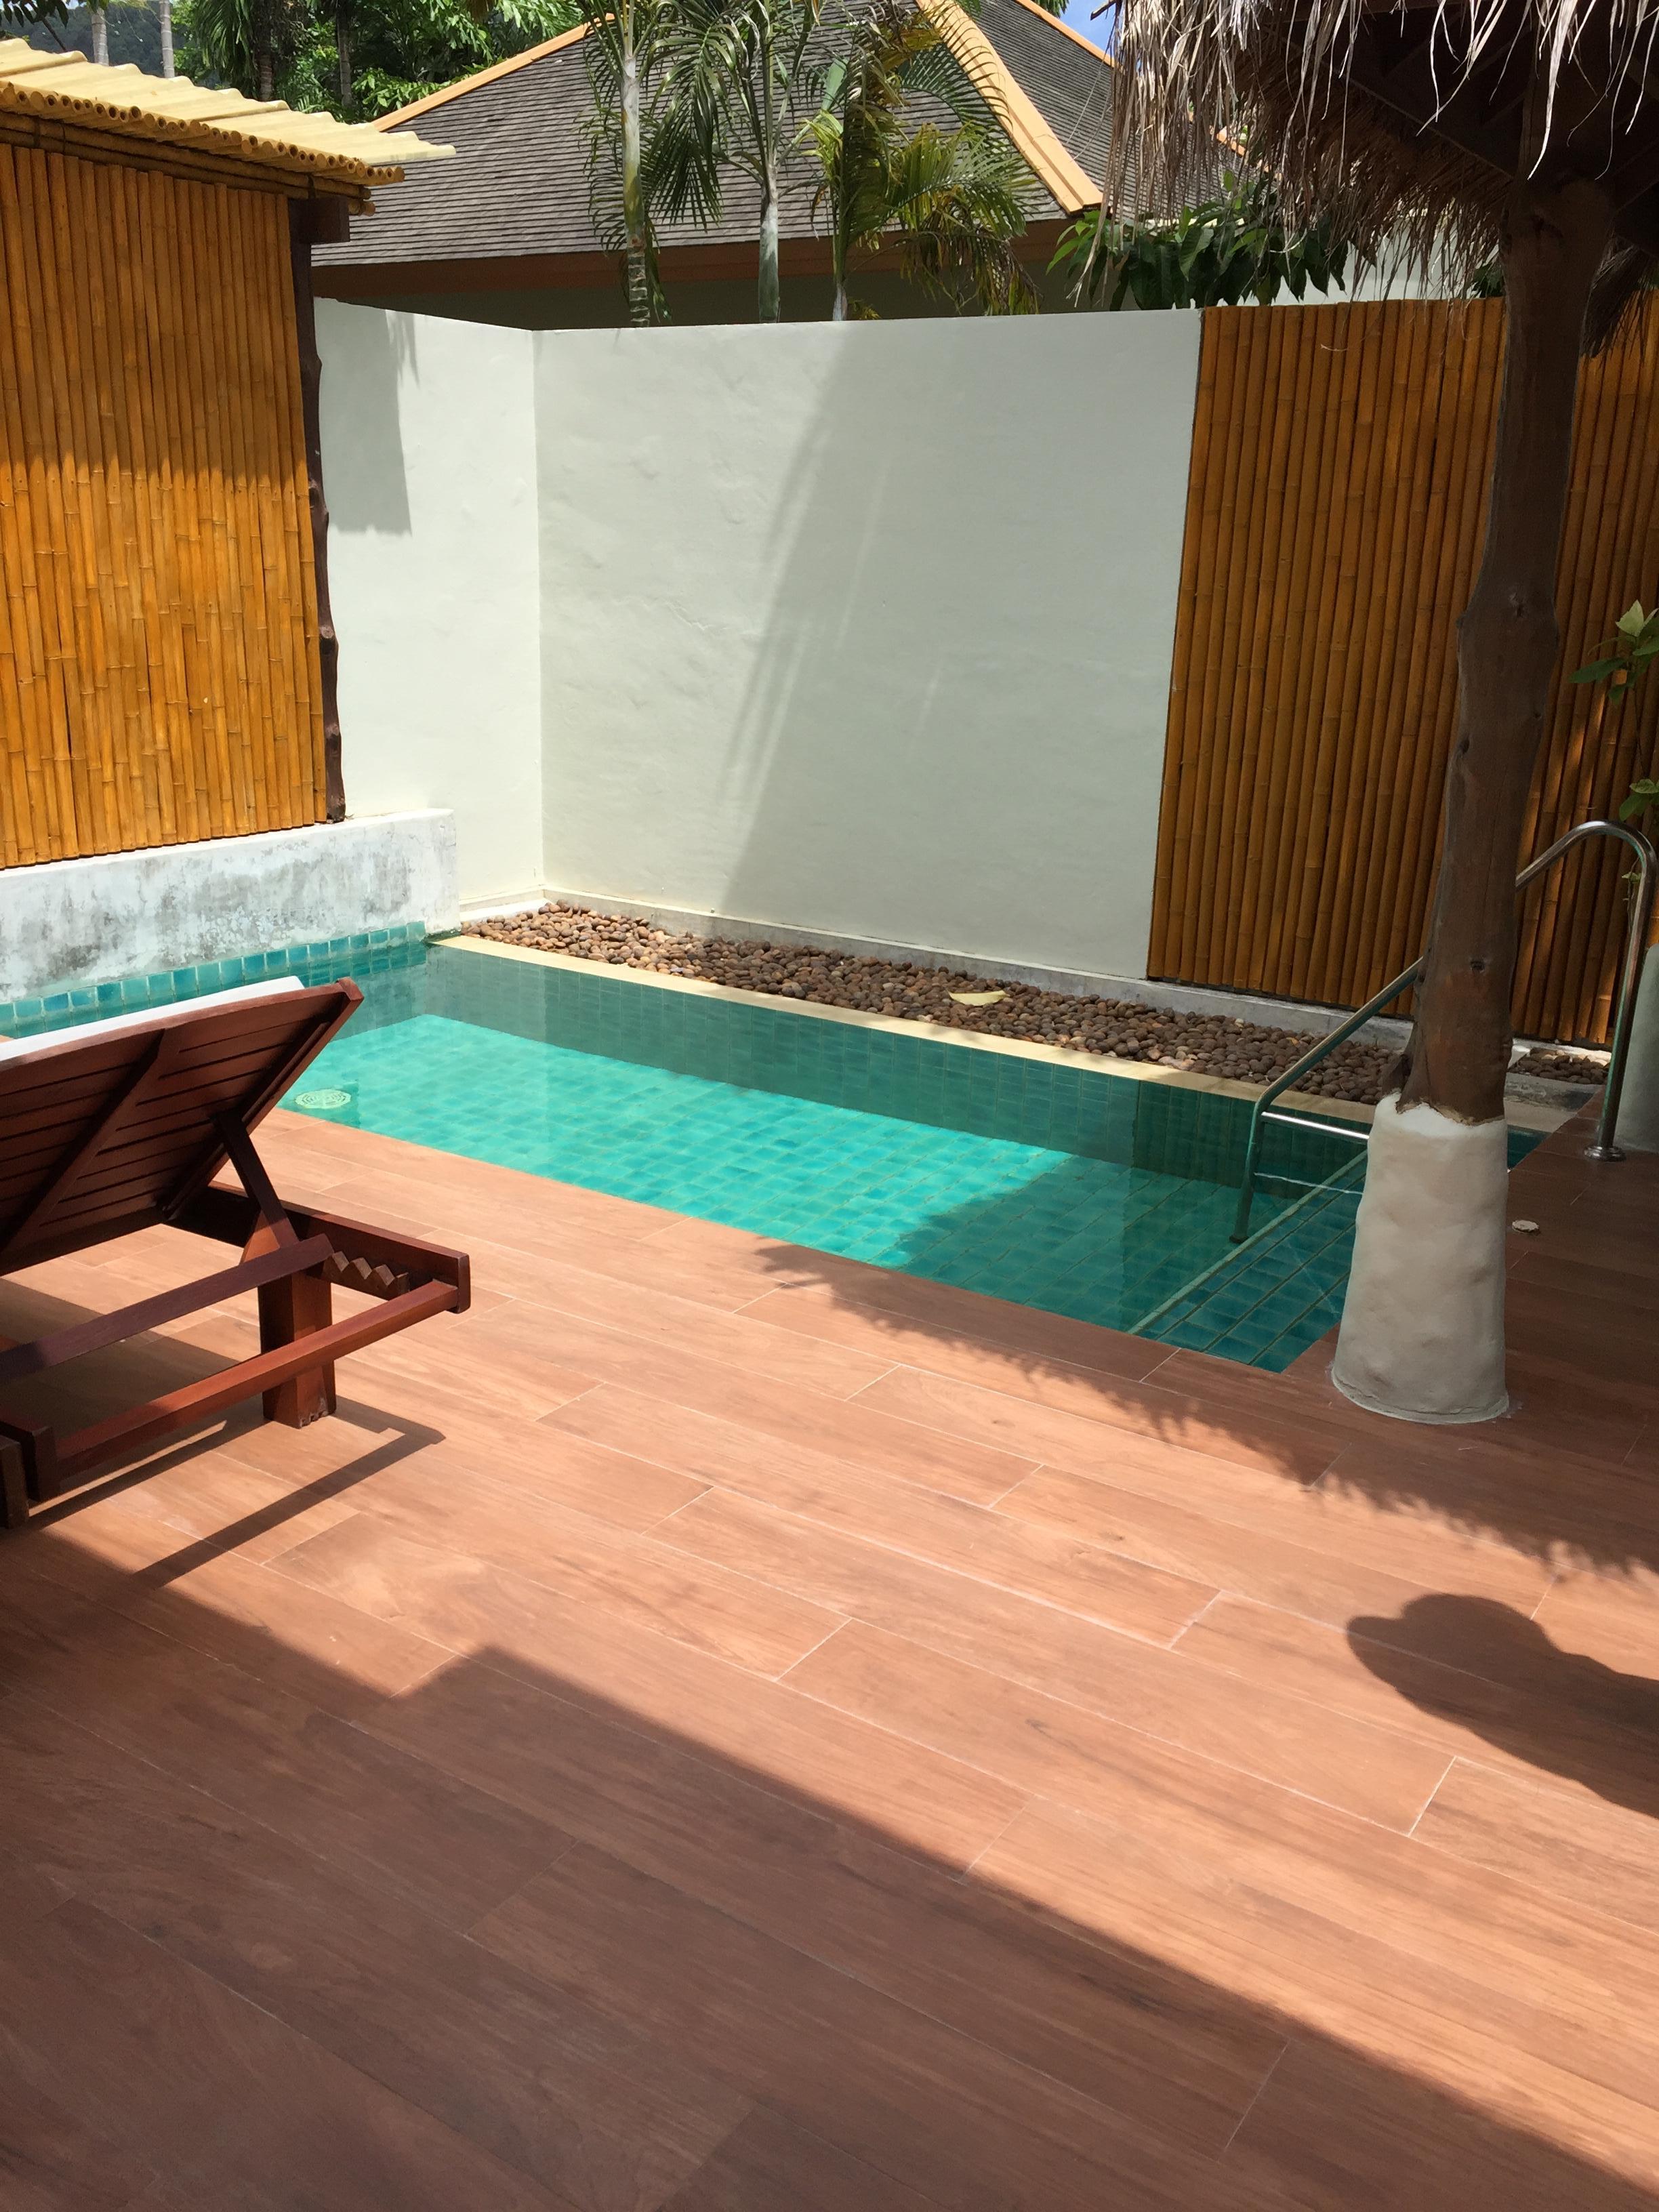 Private pool very private.